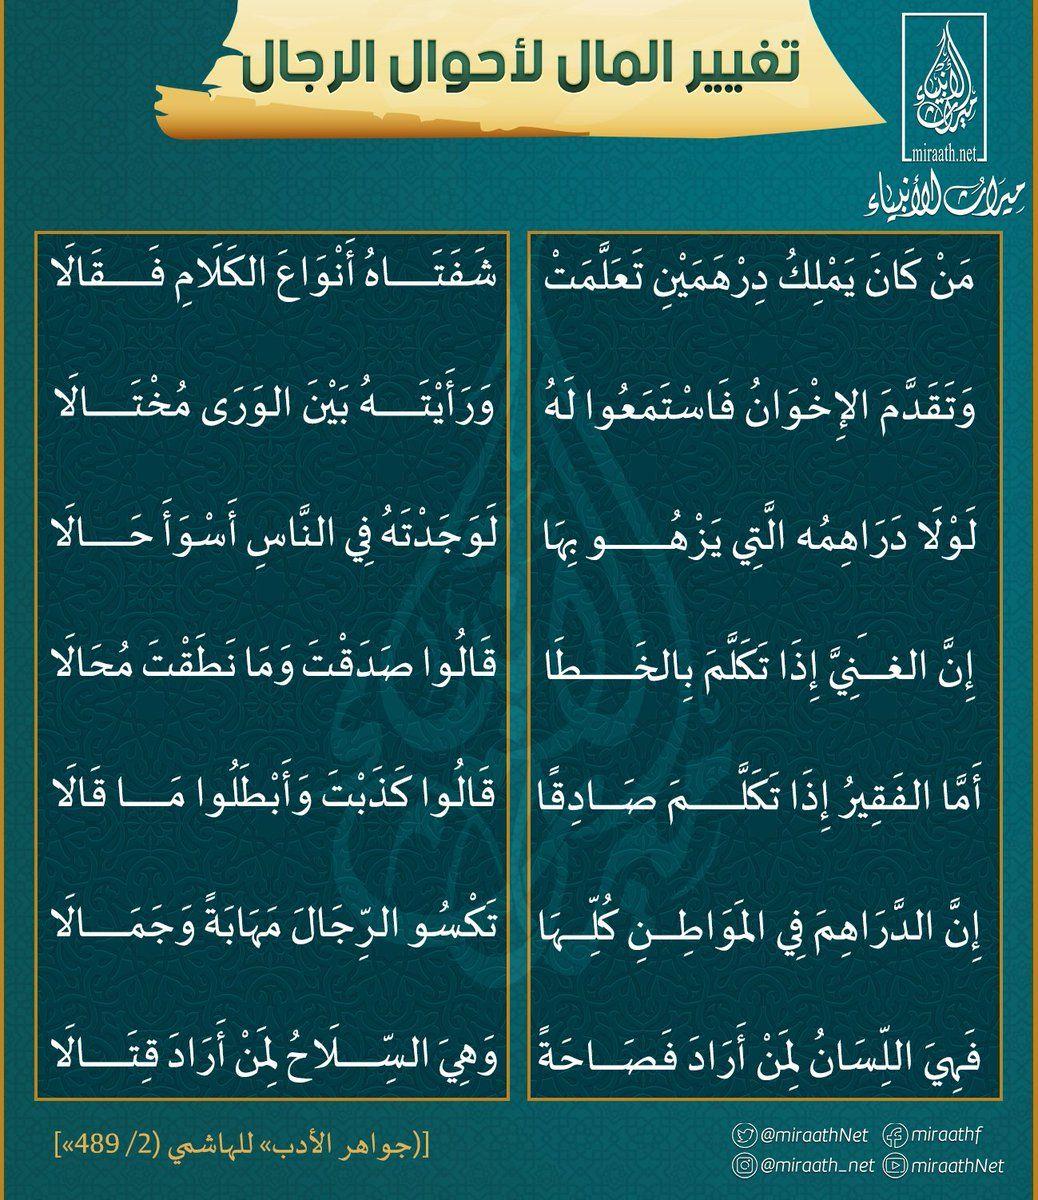 بطاقات و مطويات Miraath Cards تويتر In 2021 Words Quotes Funny Arabic Quotes Sweet Words